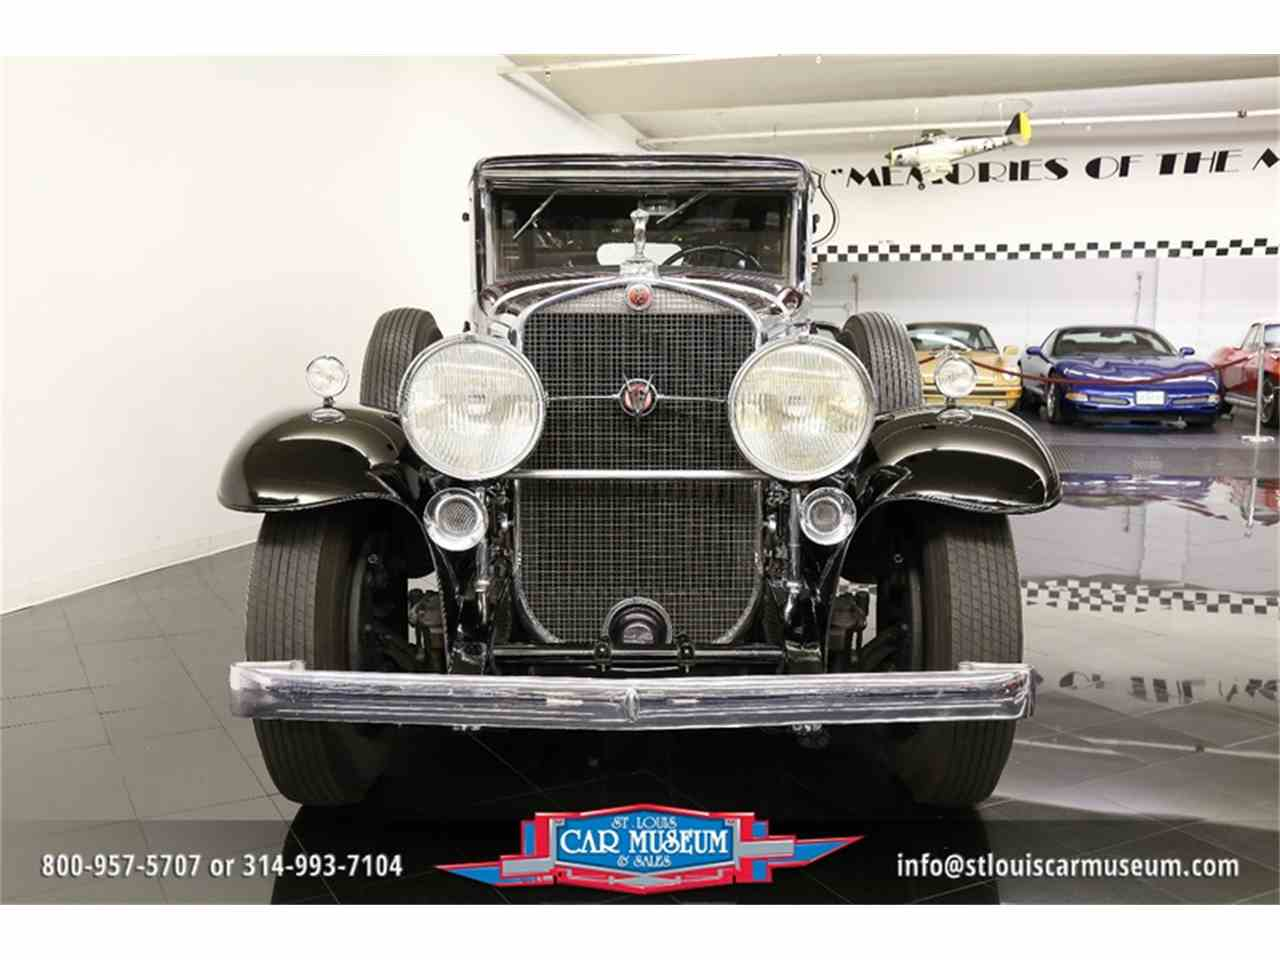 Large Picture of Classic 1931 Cadillac V-16 Madam X Landau Sedan located in St. Louis Missouri - JSU3